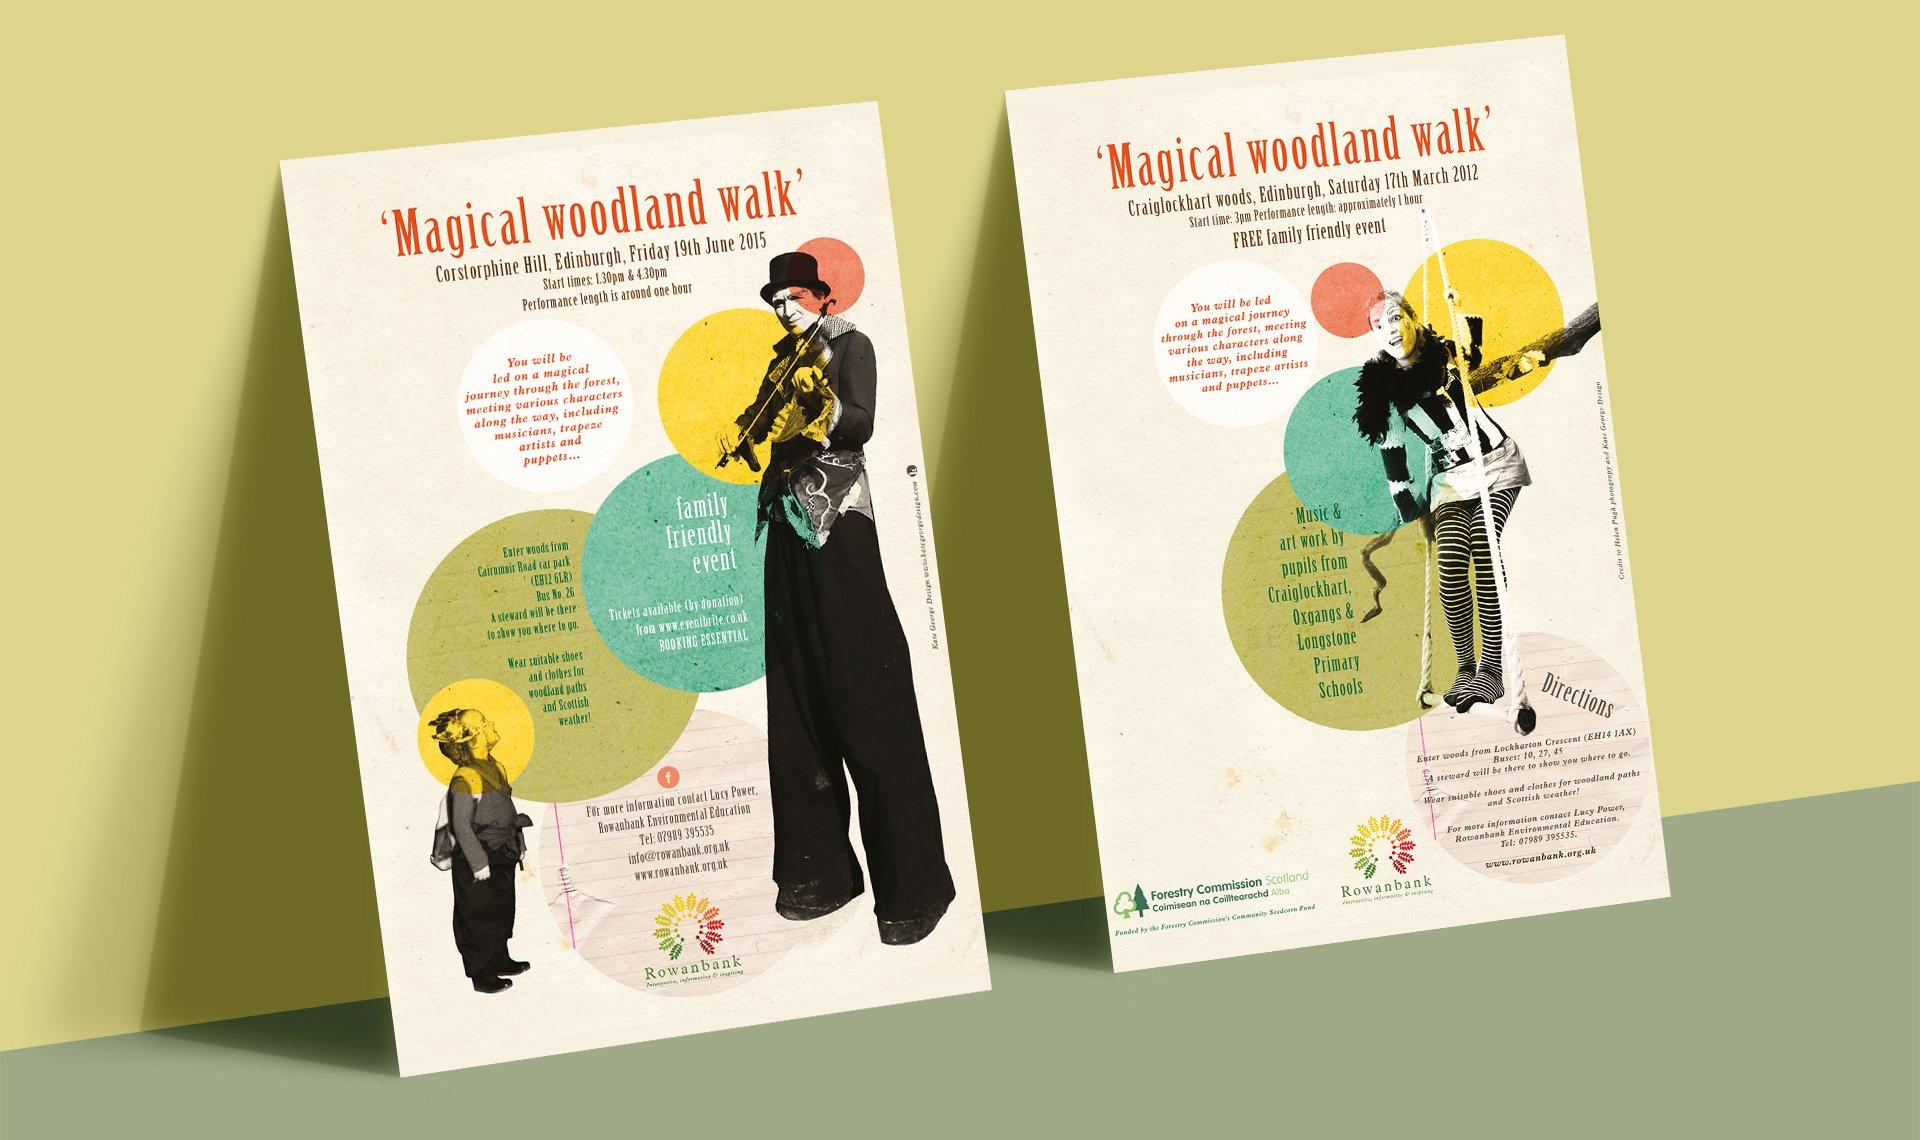 Rowanbank Environmental Arts flyers for Magical Woodland walks